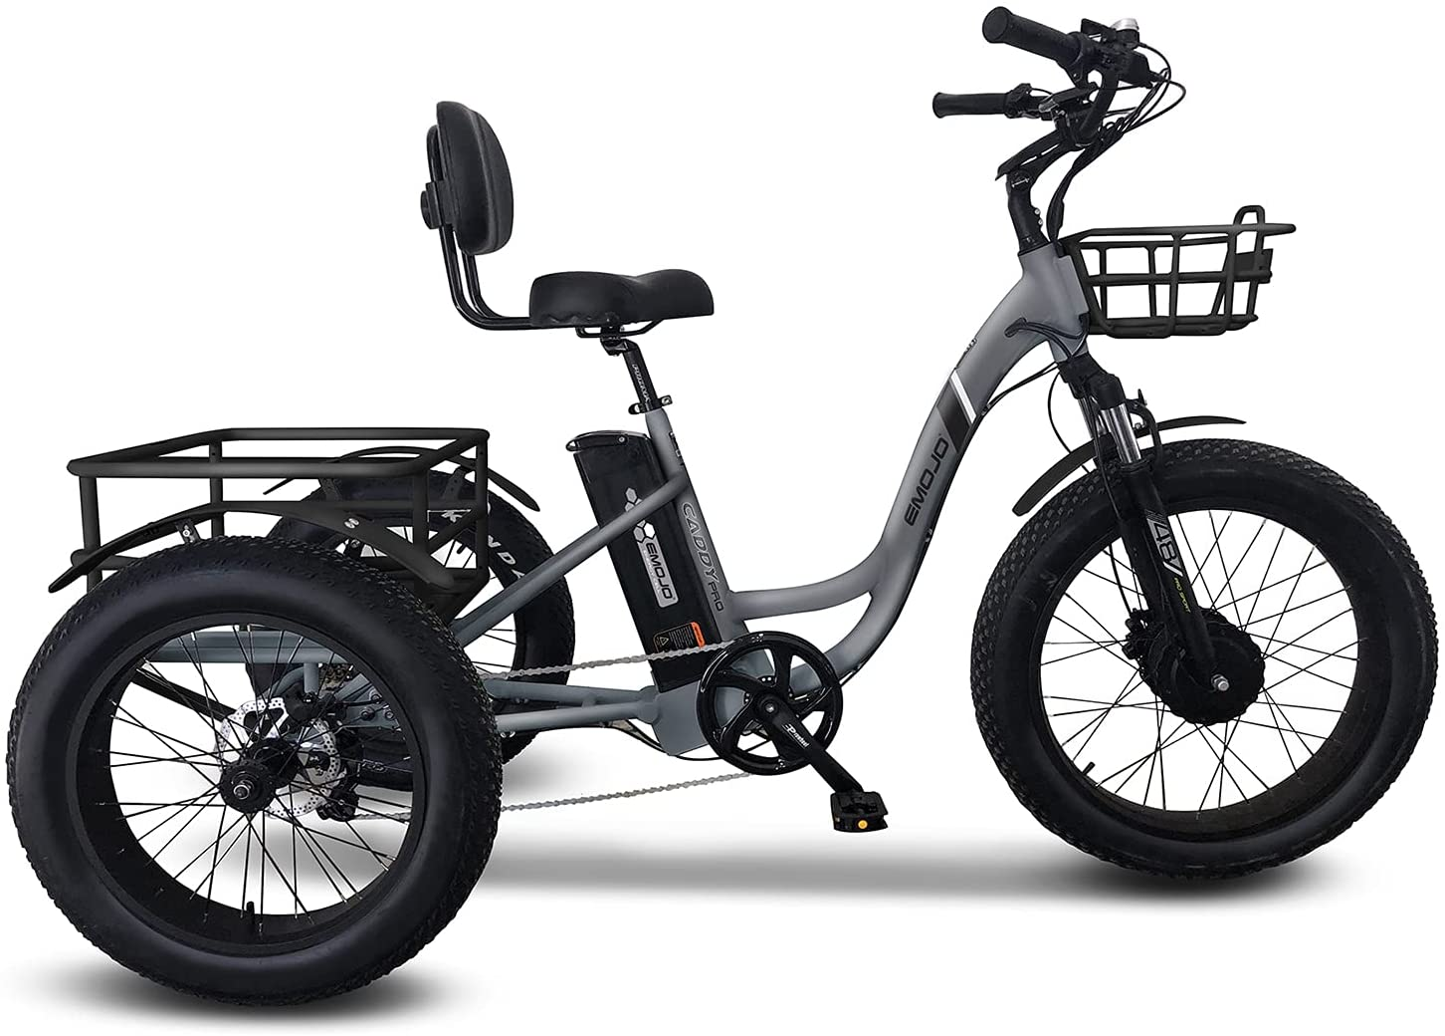 Emojo San Francisco Kansas City Mall Mall Electric Tricycle Fat Tire Caddy 48V Pro Hybri 500W Trike